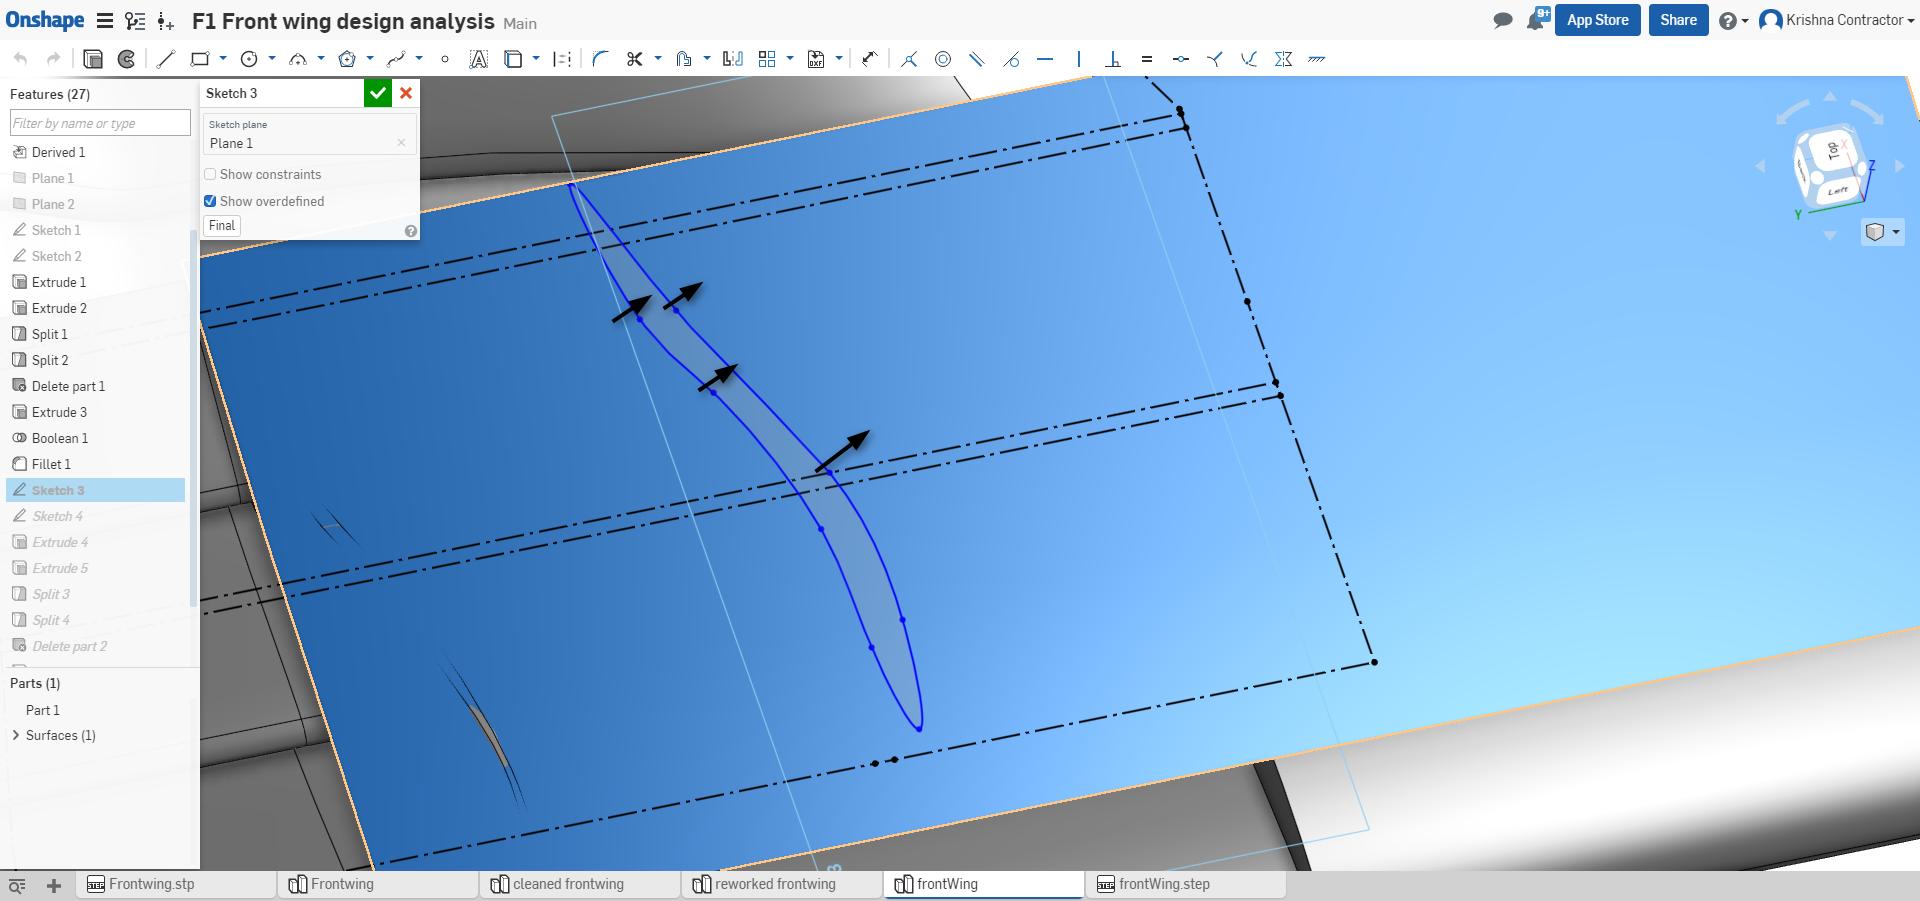 f1 aerodynamics f1 front wing vane design onshape control points